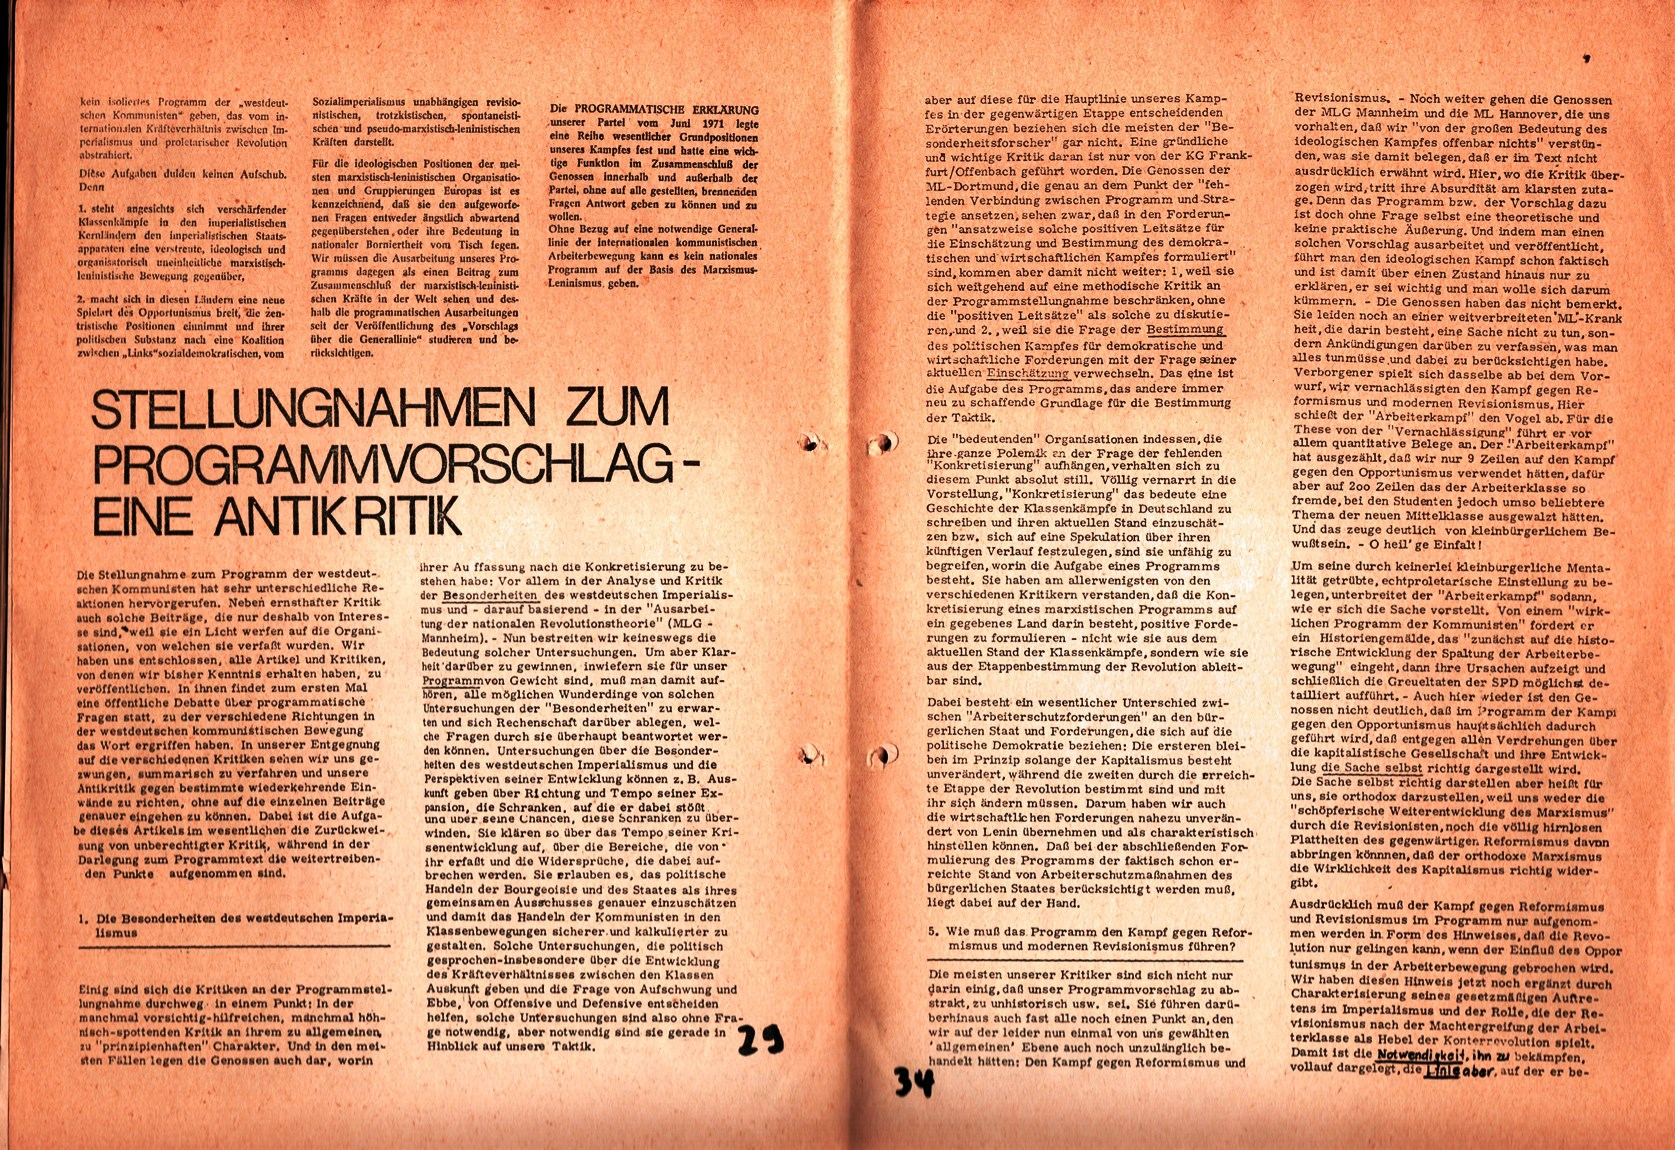 KSV_1974_Materialien_zur_Programmdiskussion_01_018